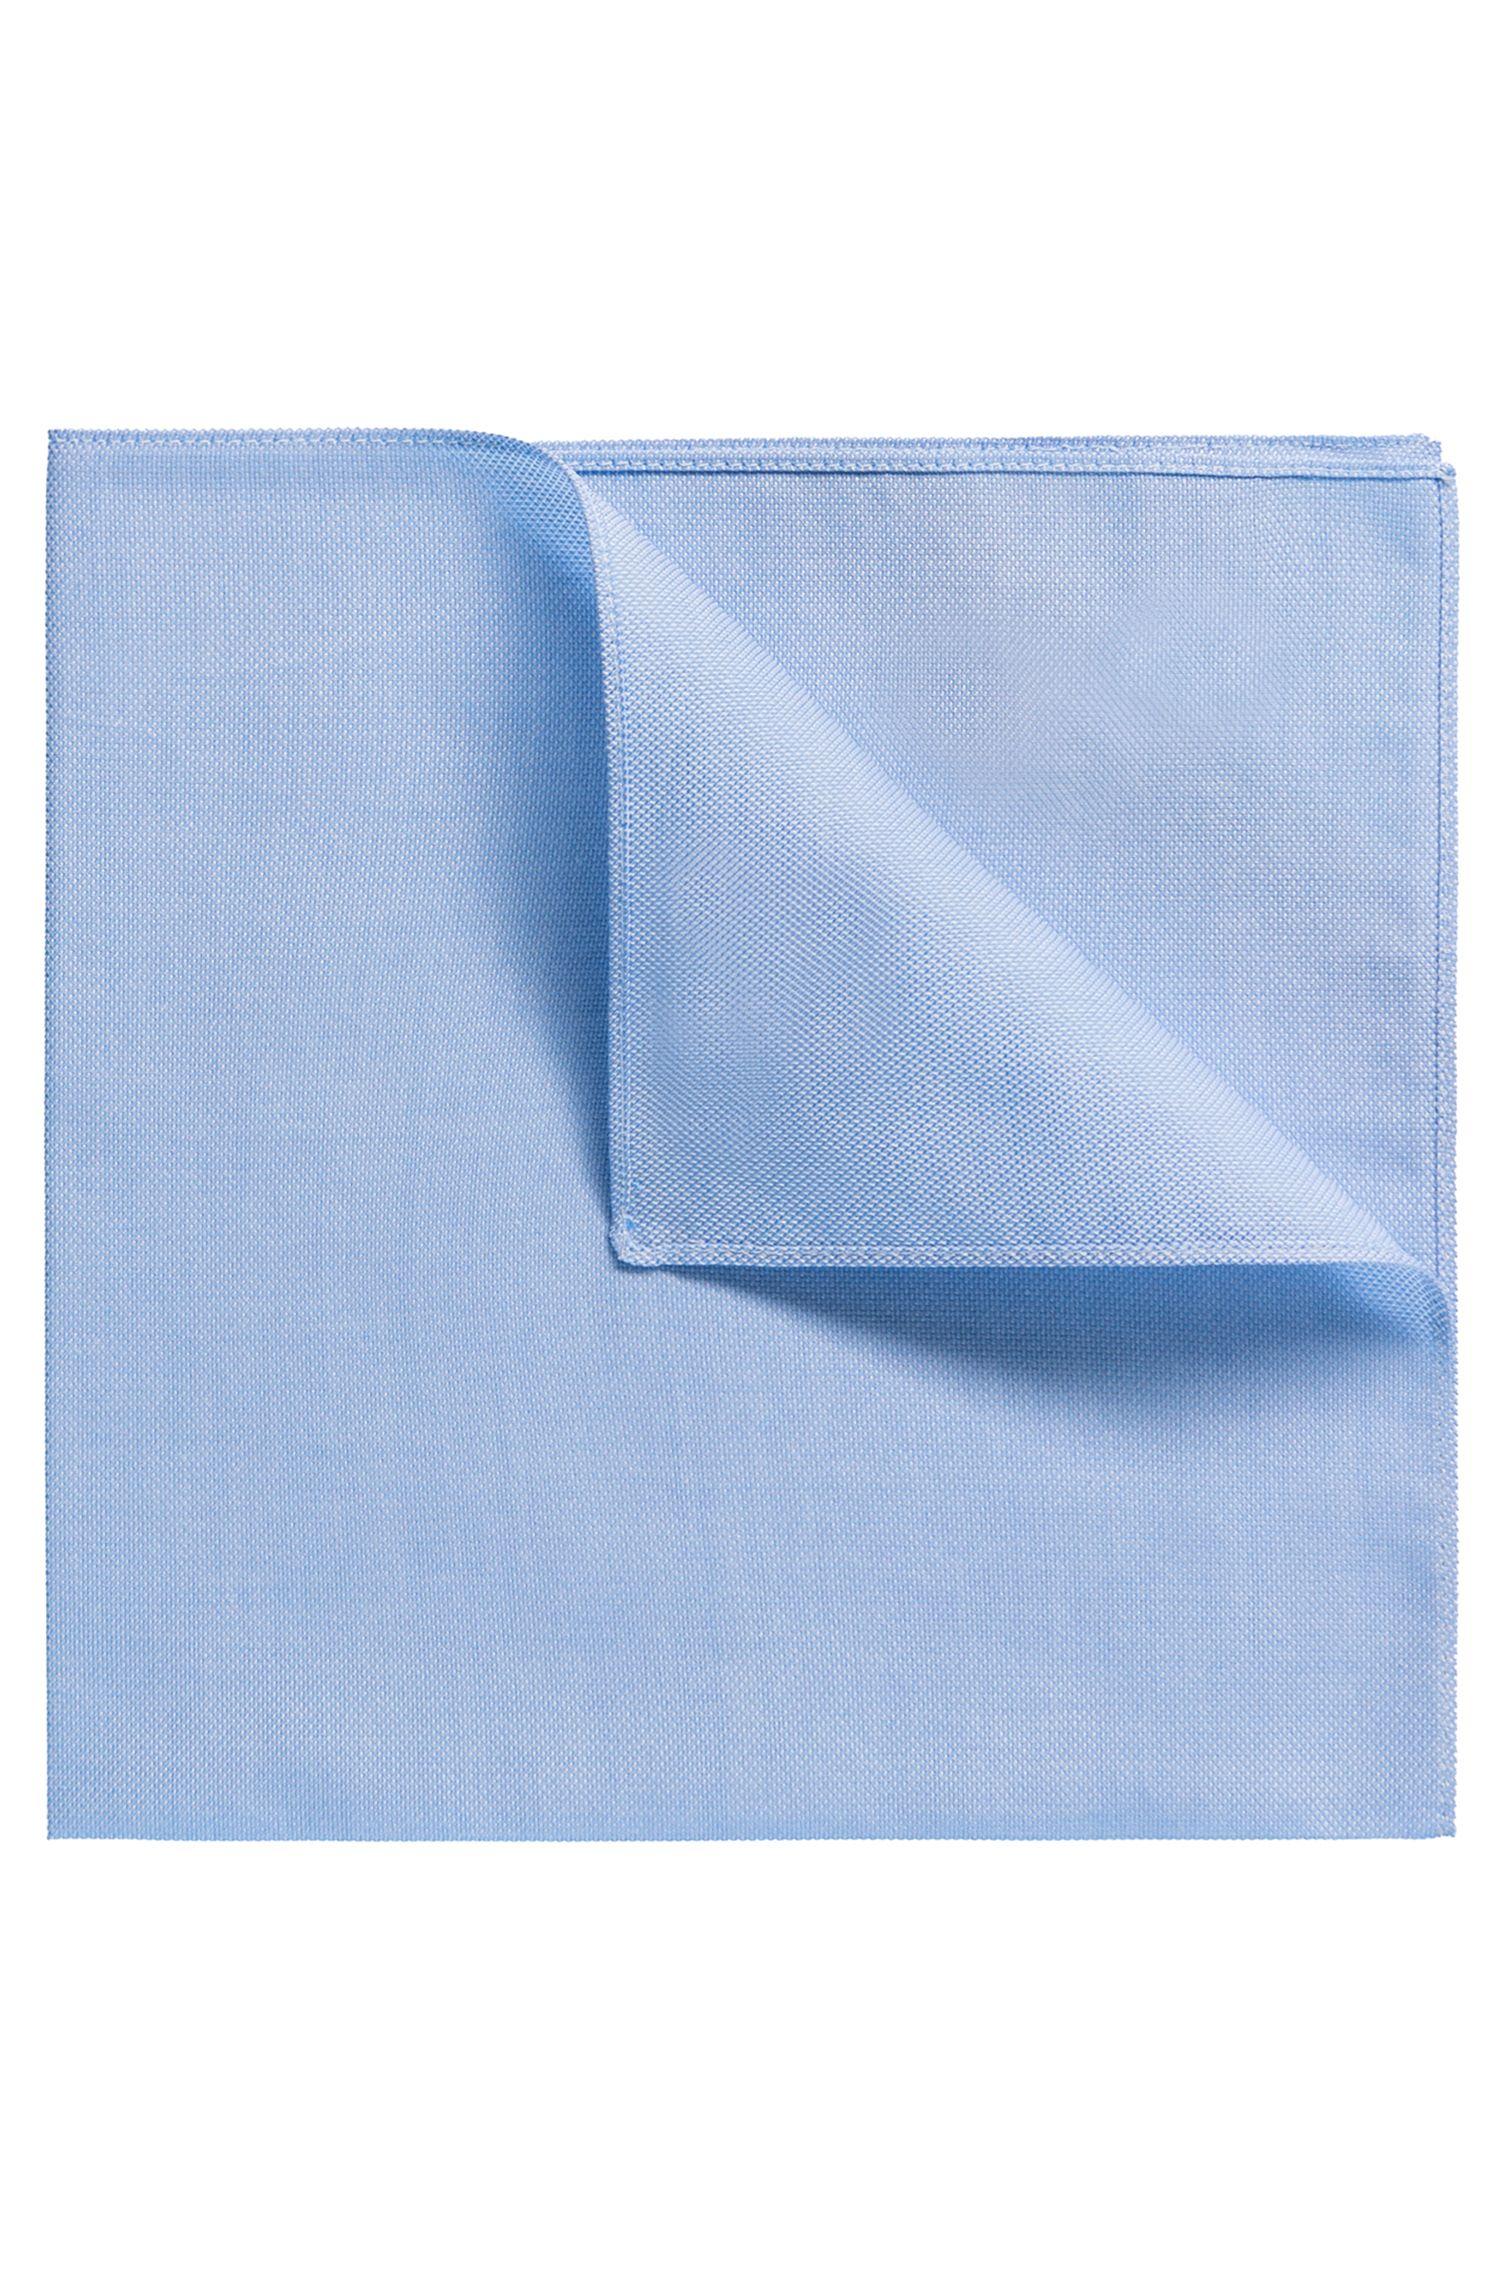 Pochette en coton uni